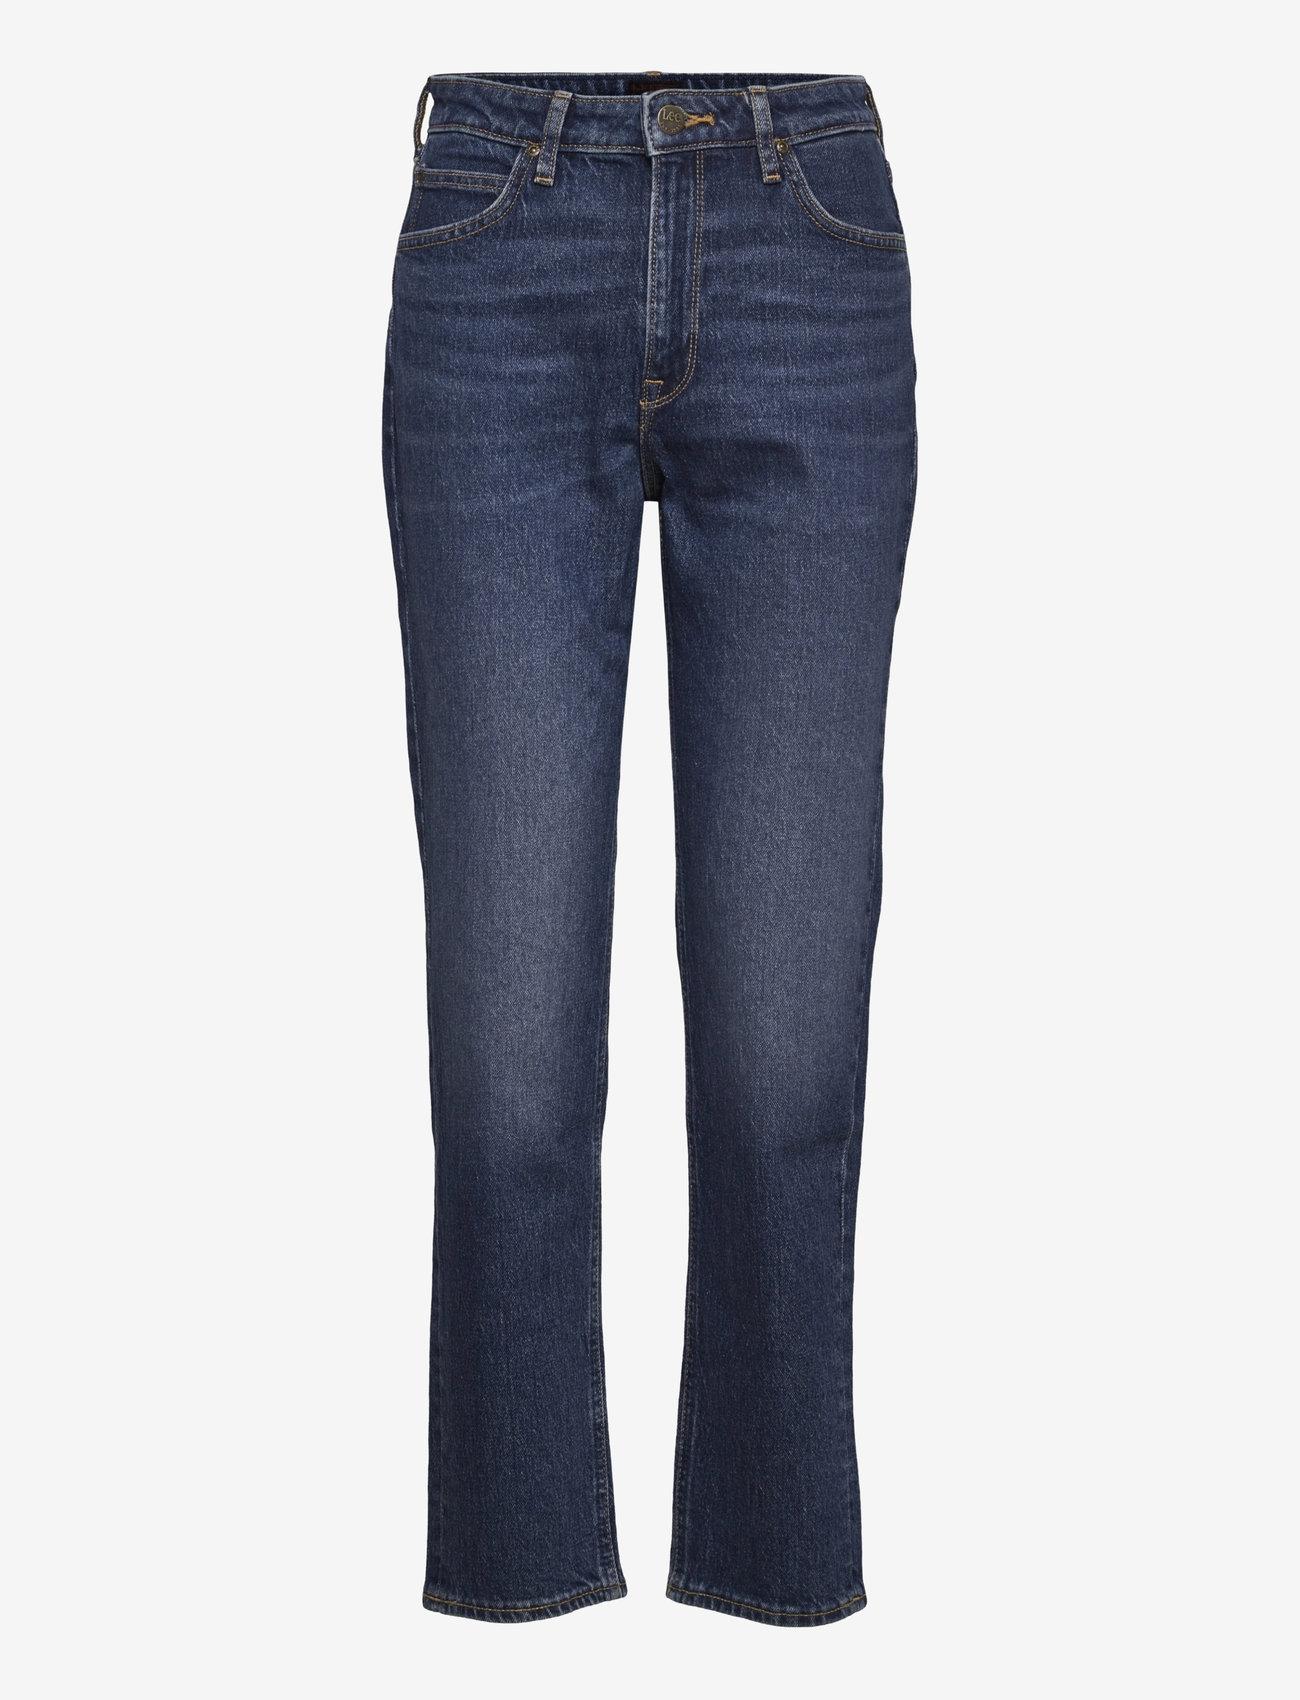 Lee Jeans - CAROL - straight jeans - dark ruby - 0